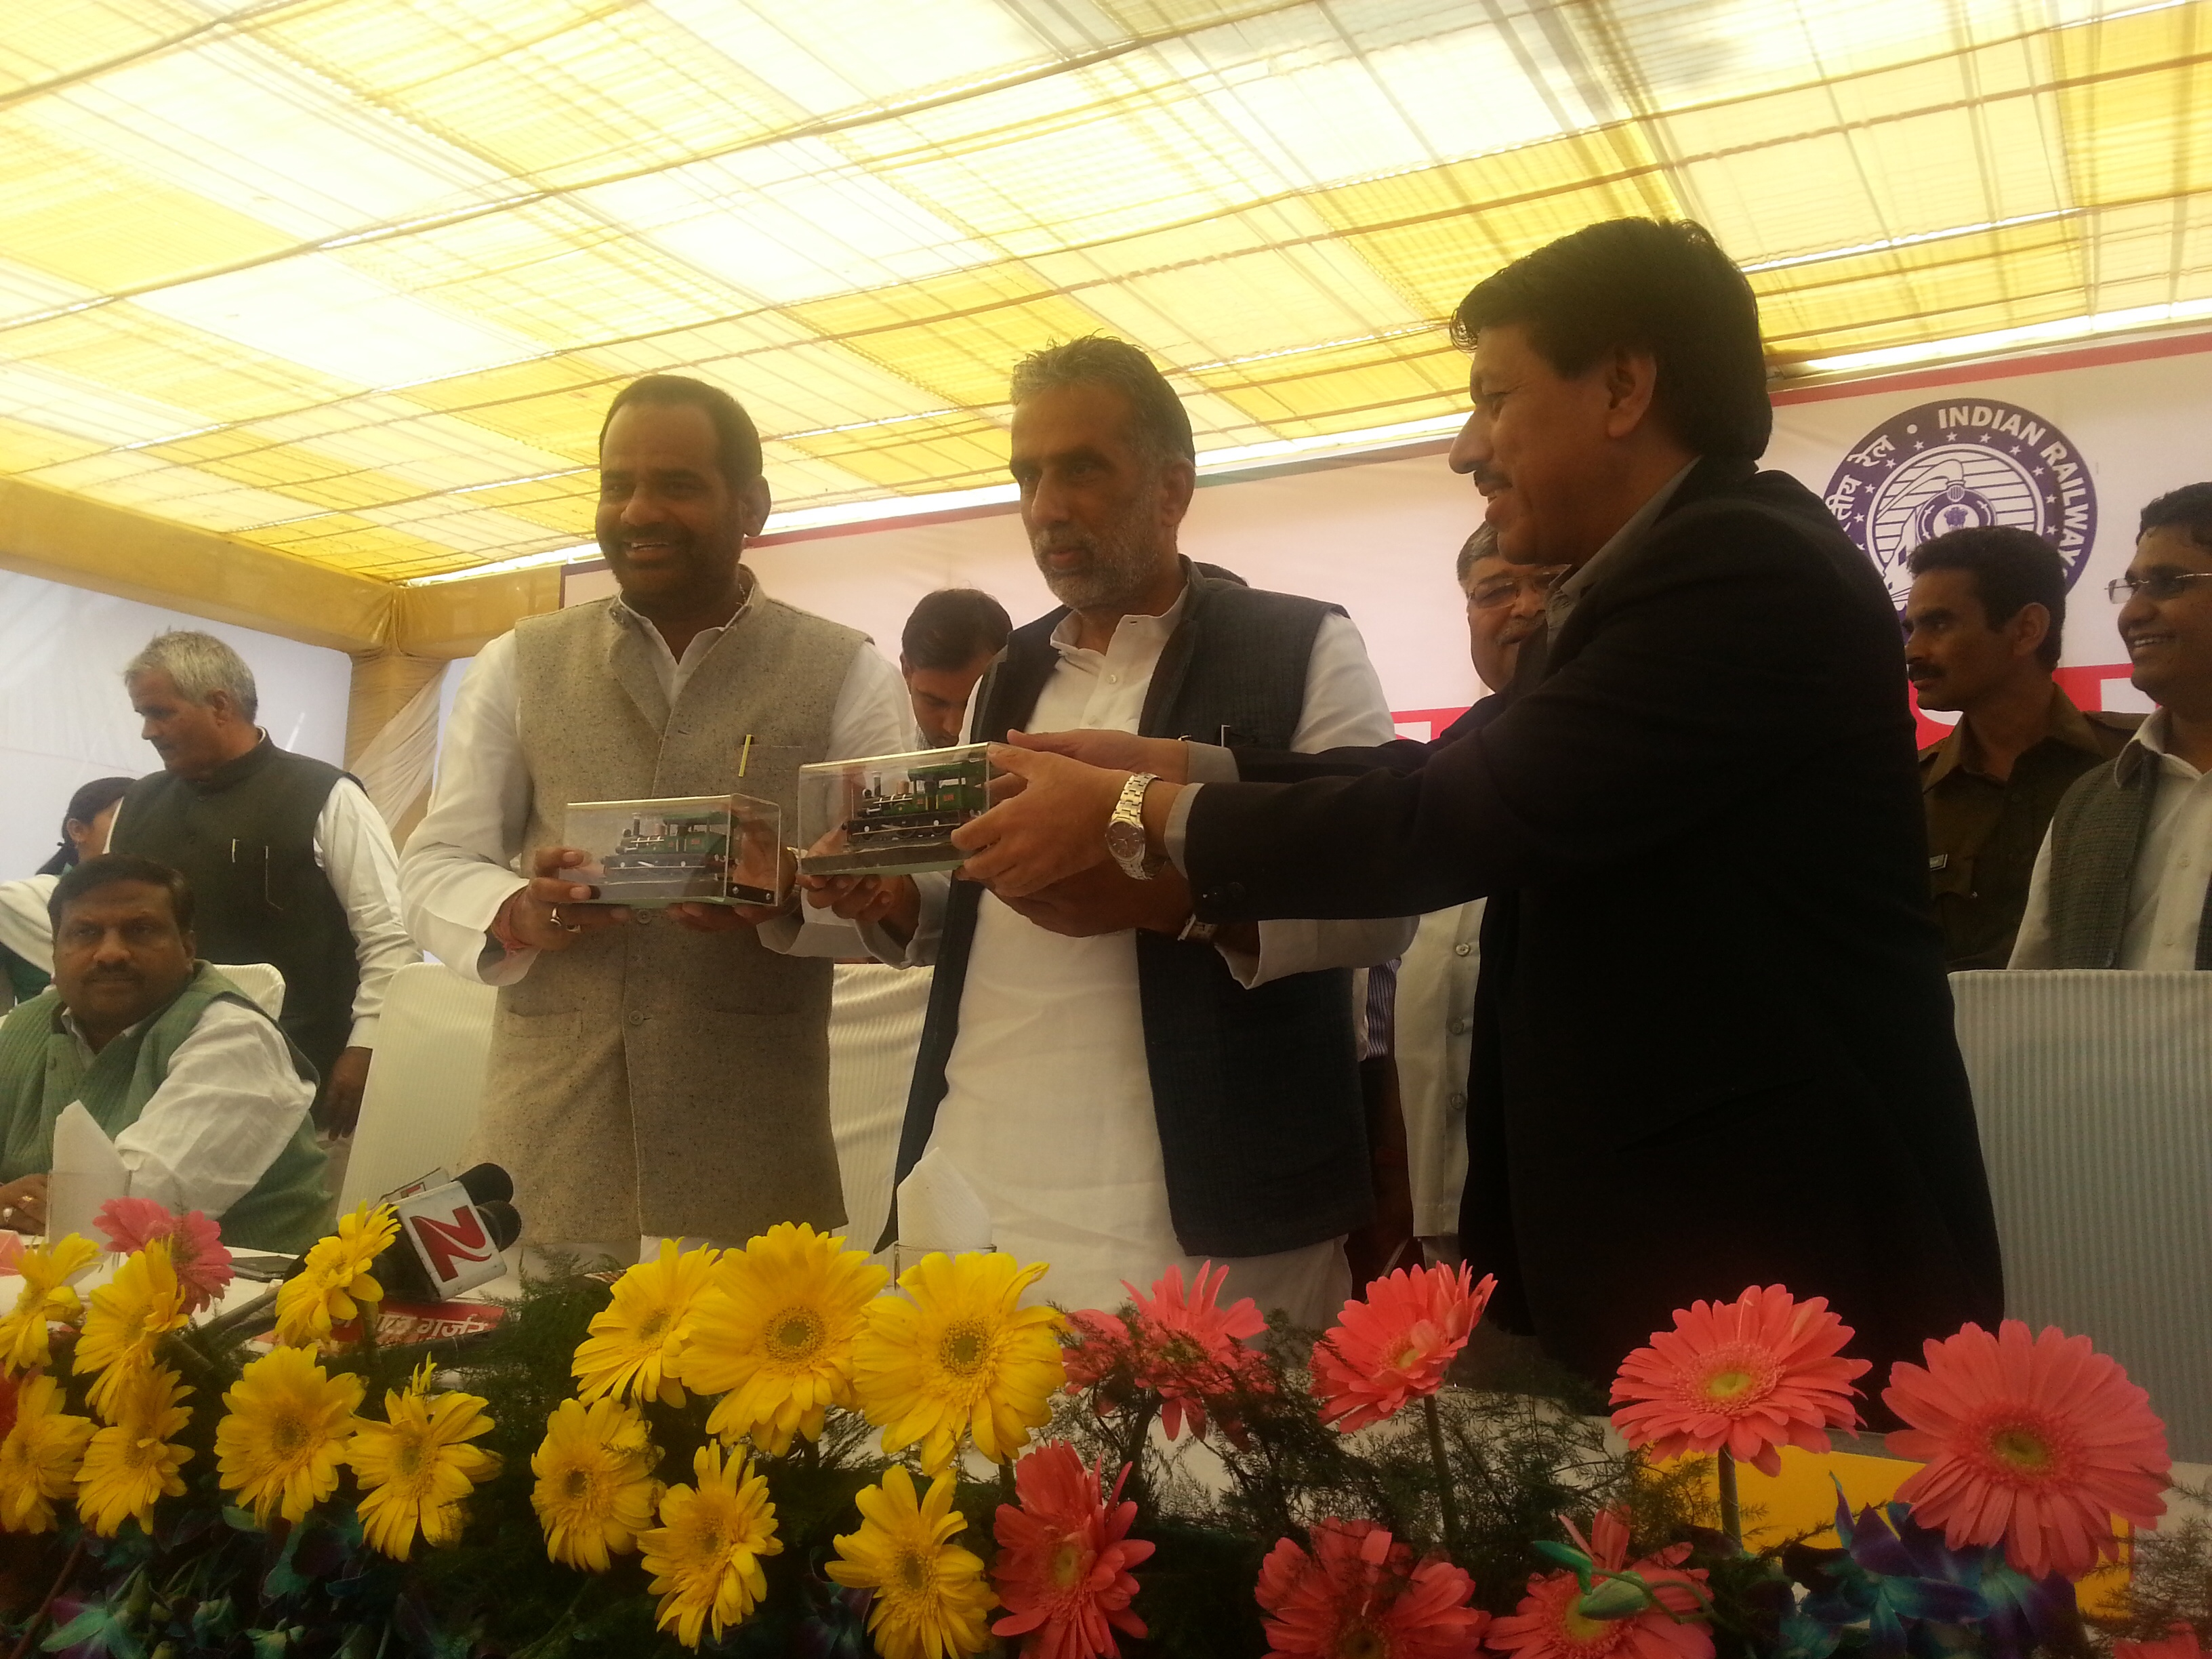 27.02.2015 Palwal to Aligarh Train Inauguration